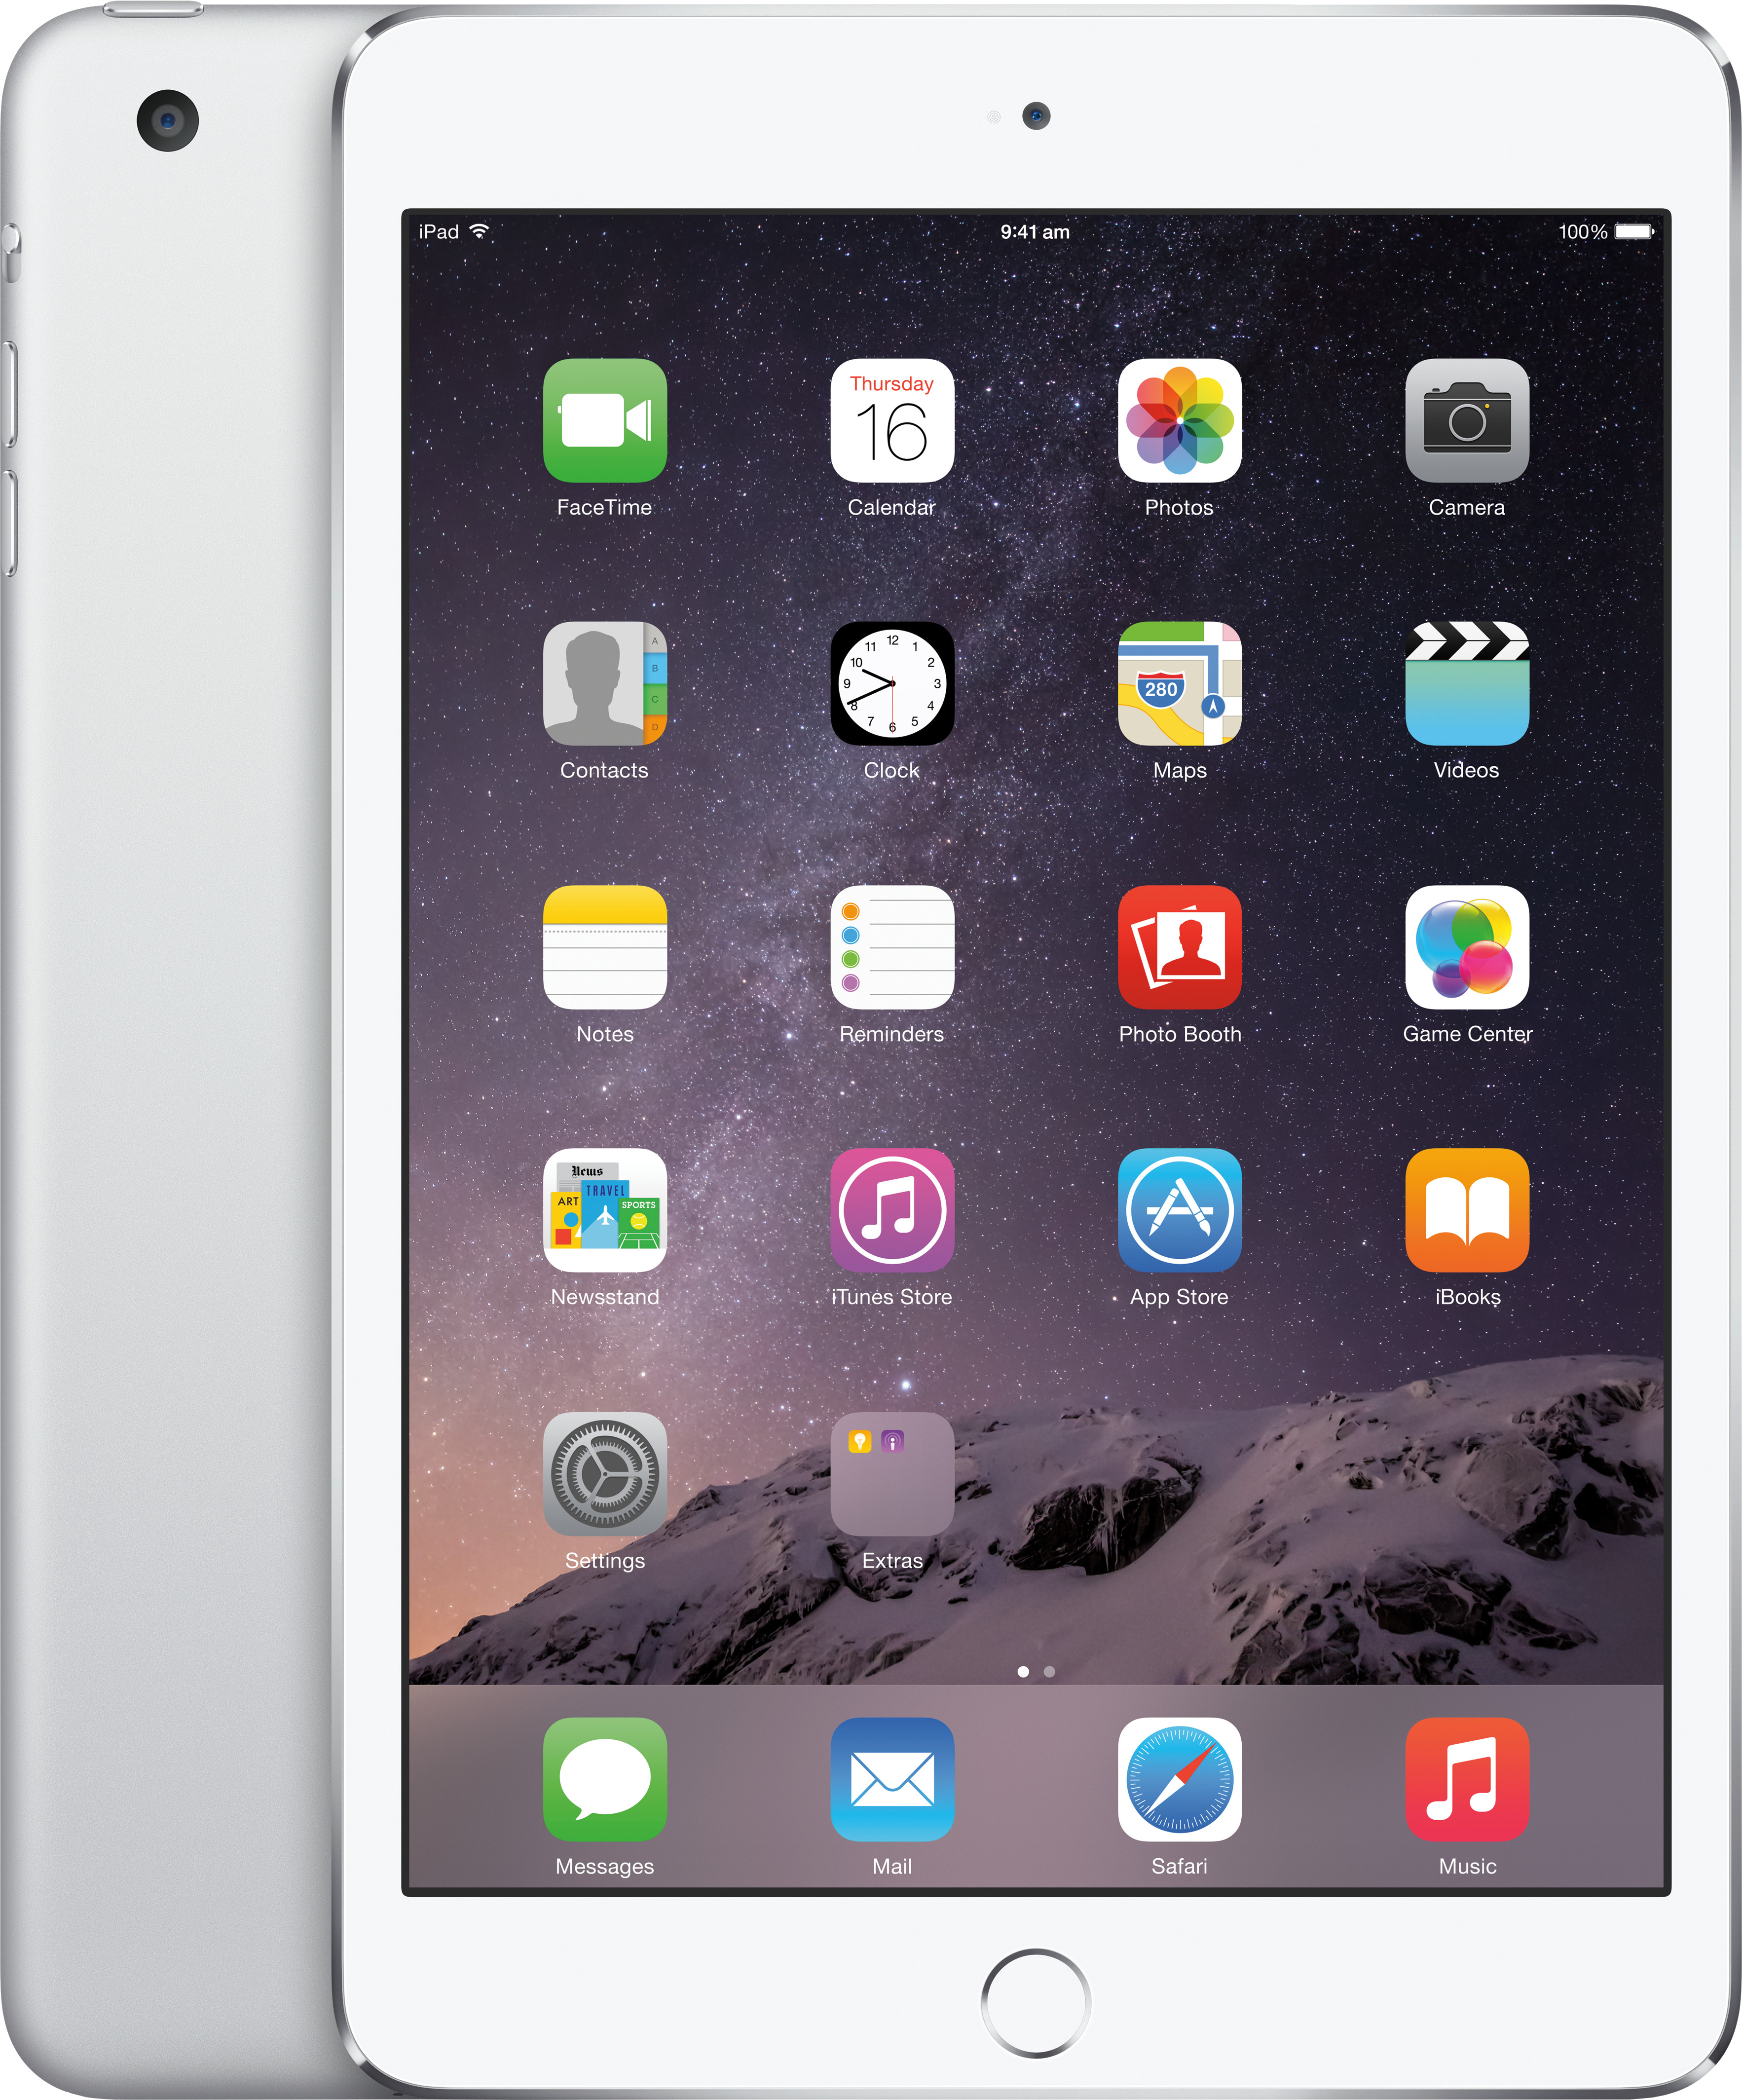 Apple iPad Air 2 Wi-Fi 64 GB Tablet Silver, 64 GB, Wi-Fi Only